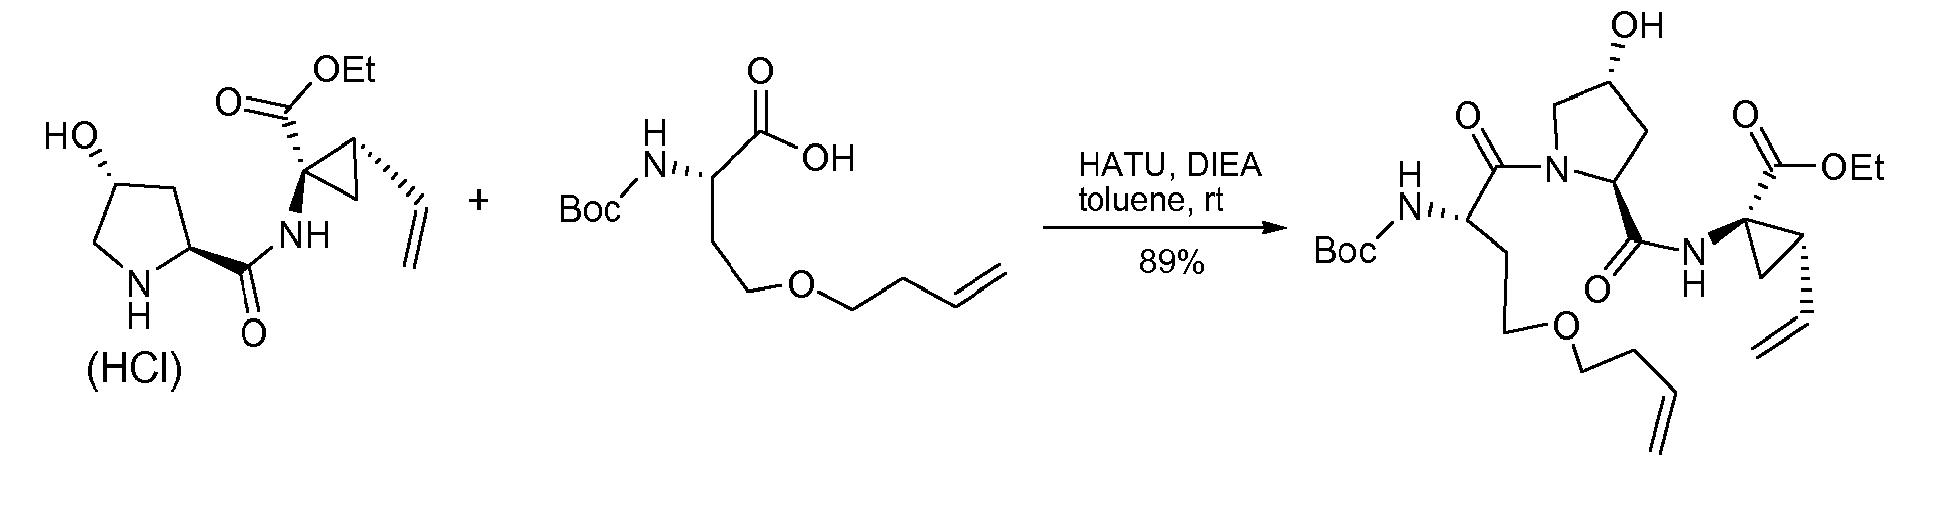 Figure imgb0515